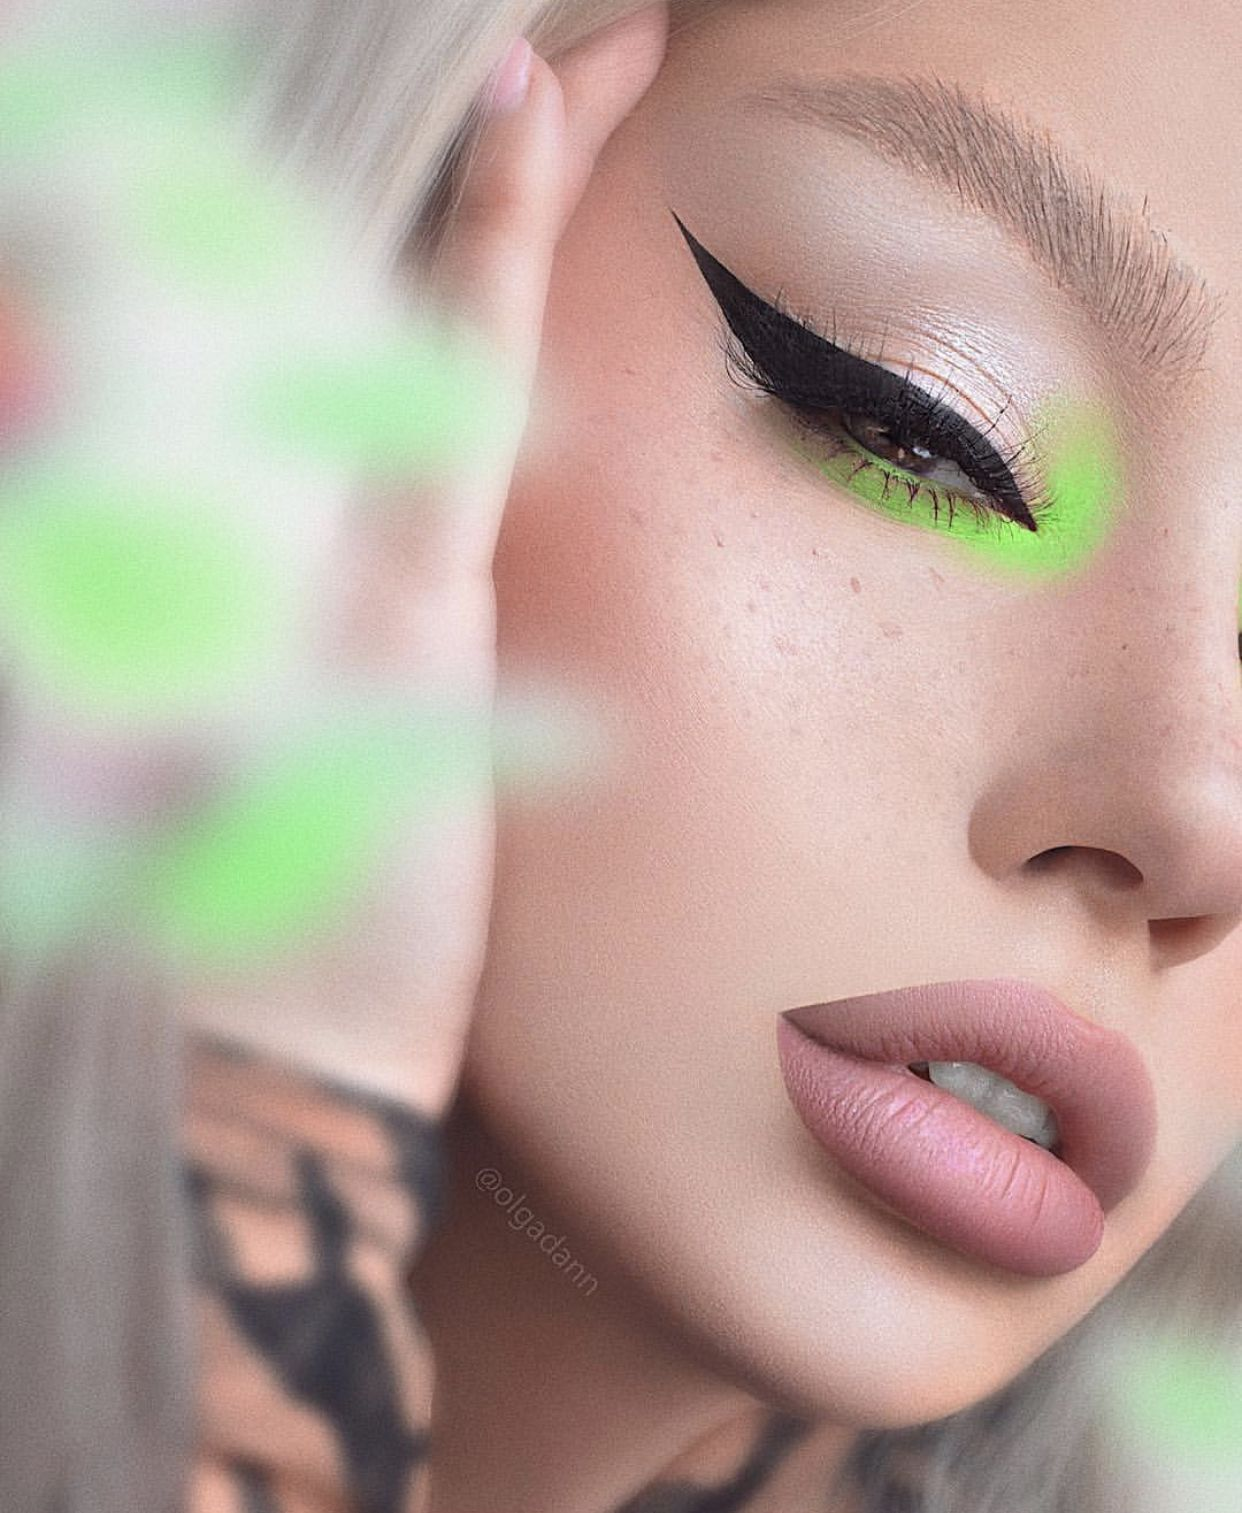 Maquillage néon Maquillage yeux coloré, Maquillage